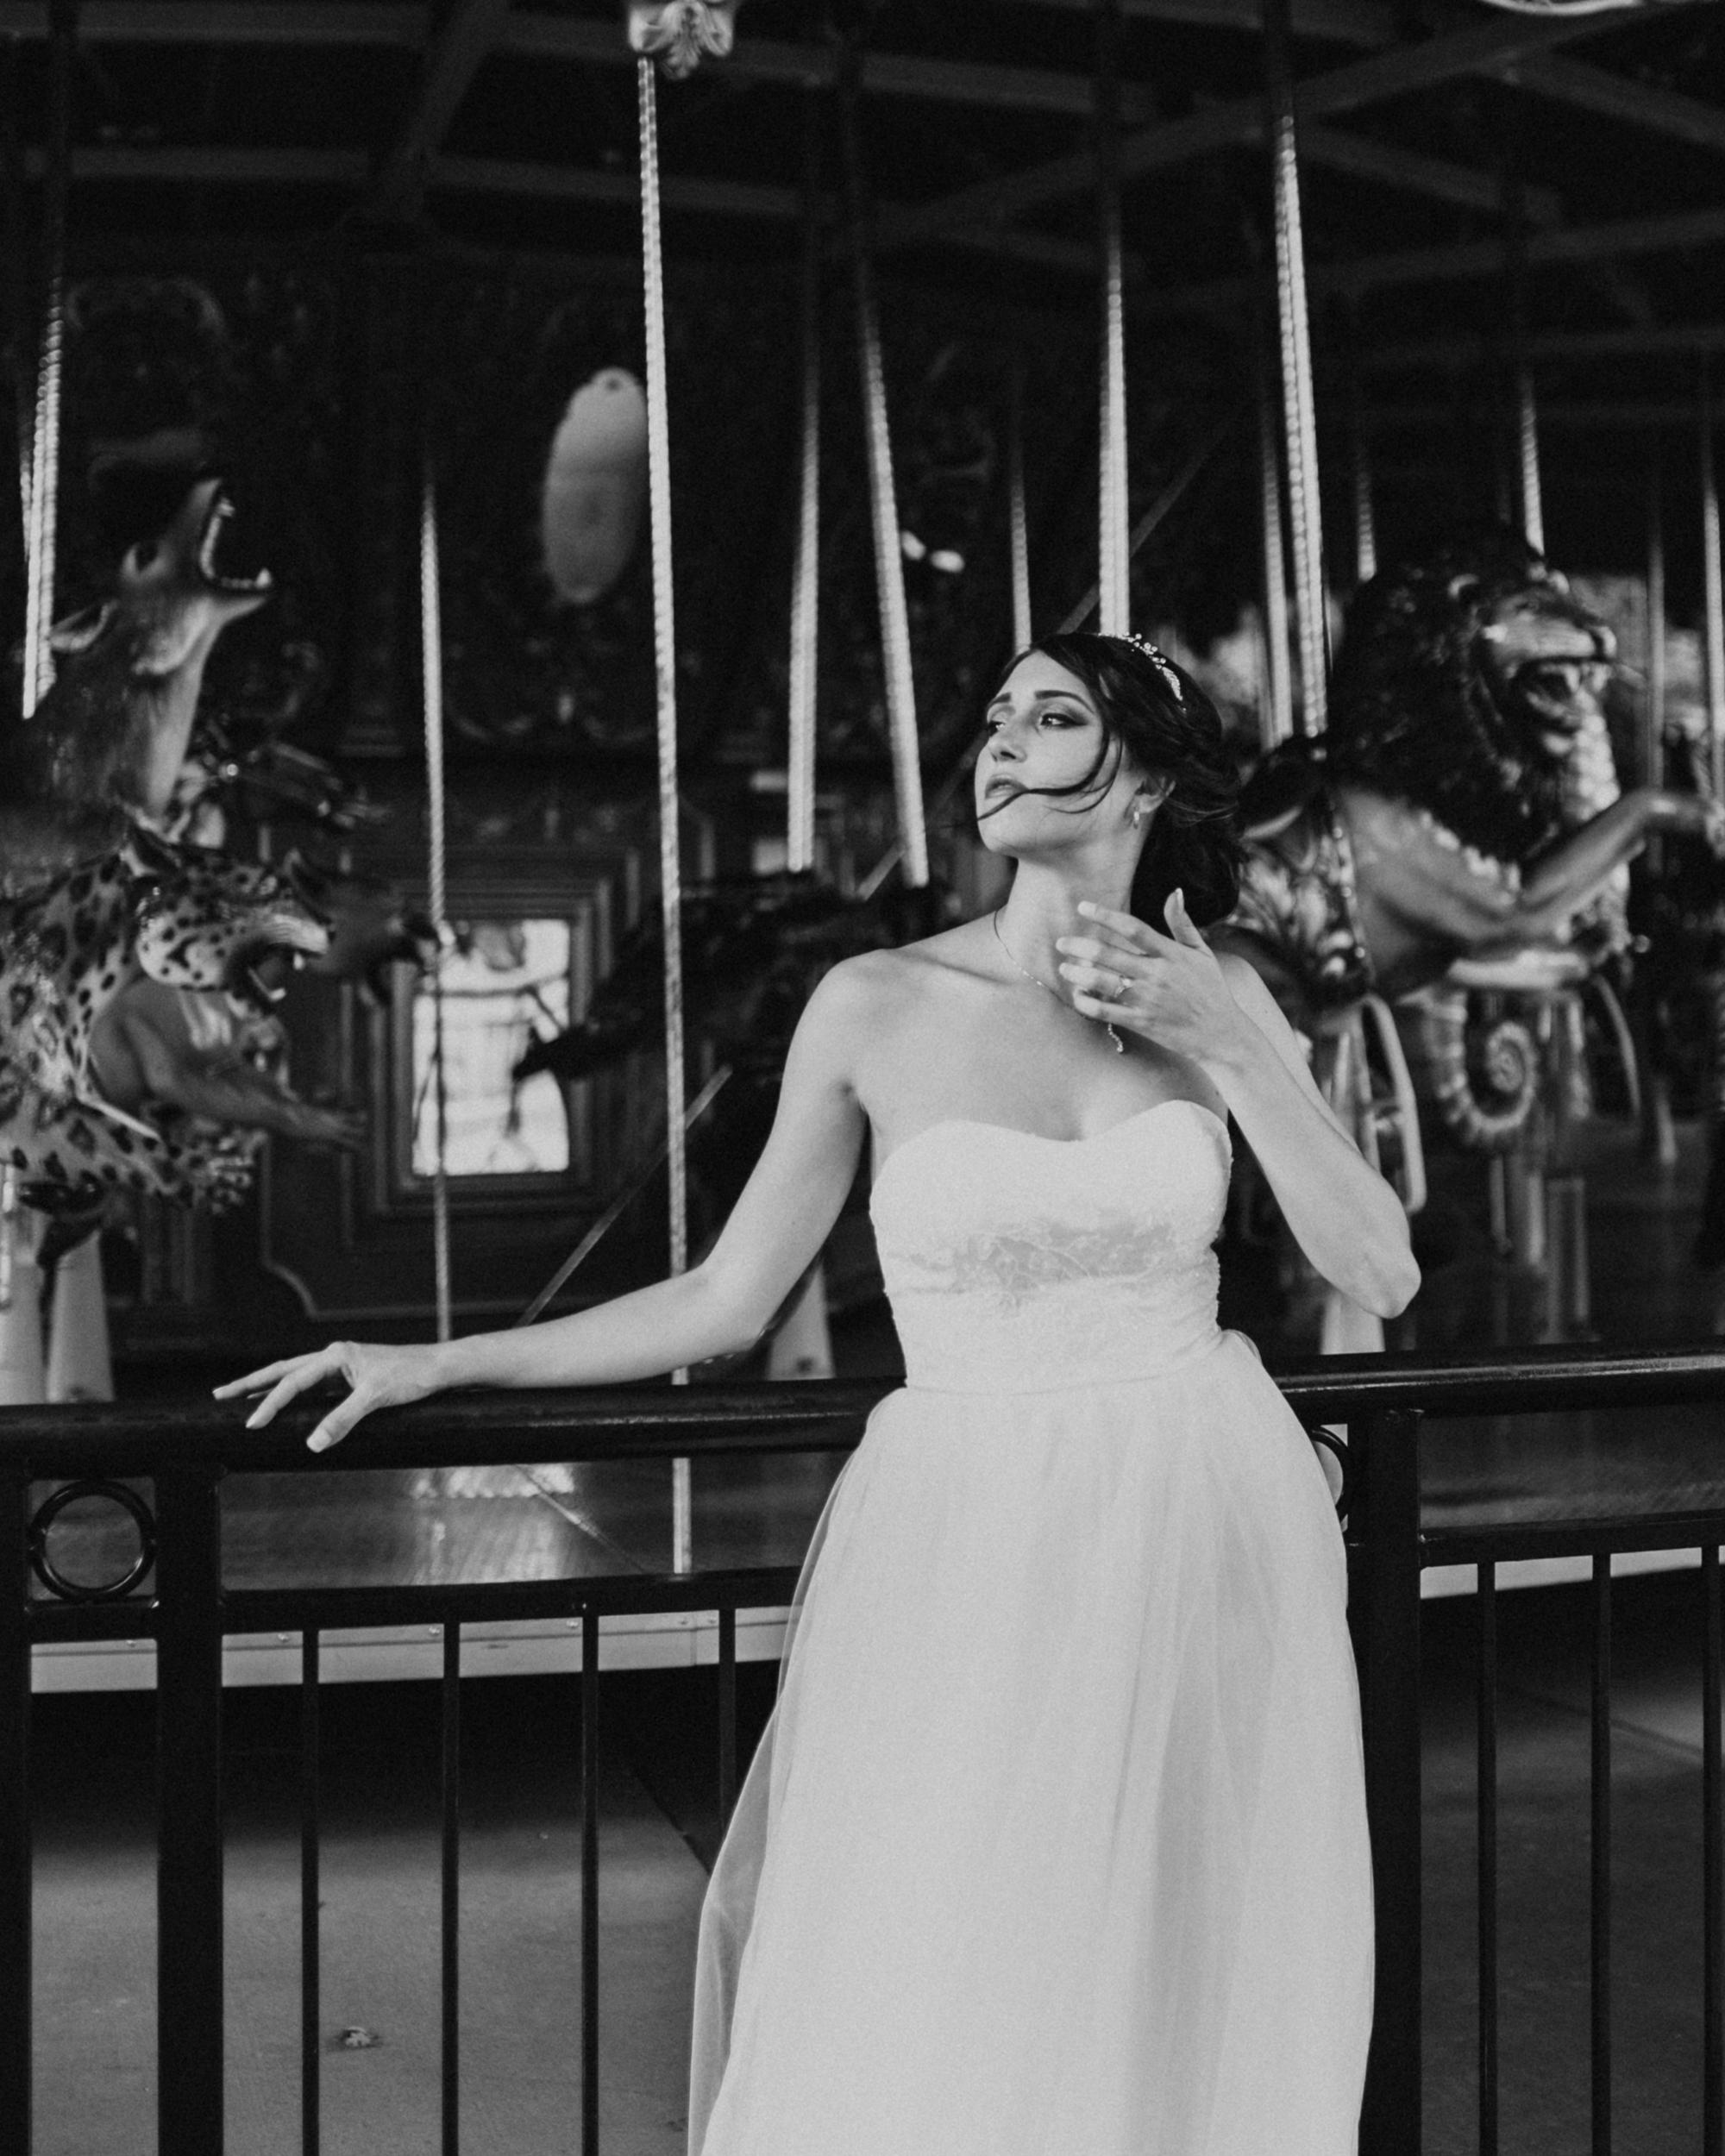 L'Cee_Bridal-66.jpg